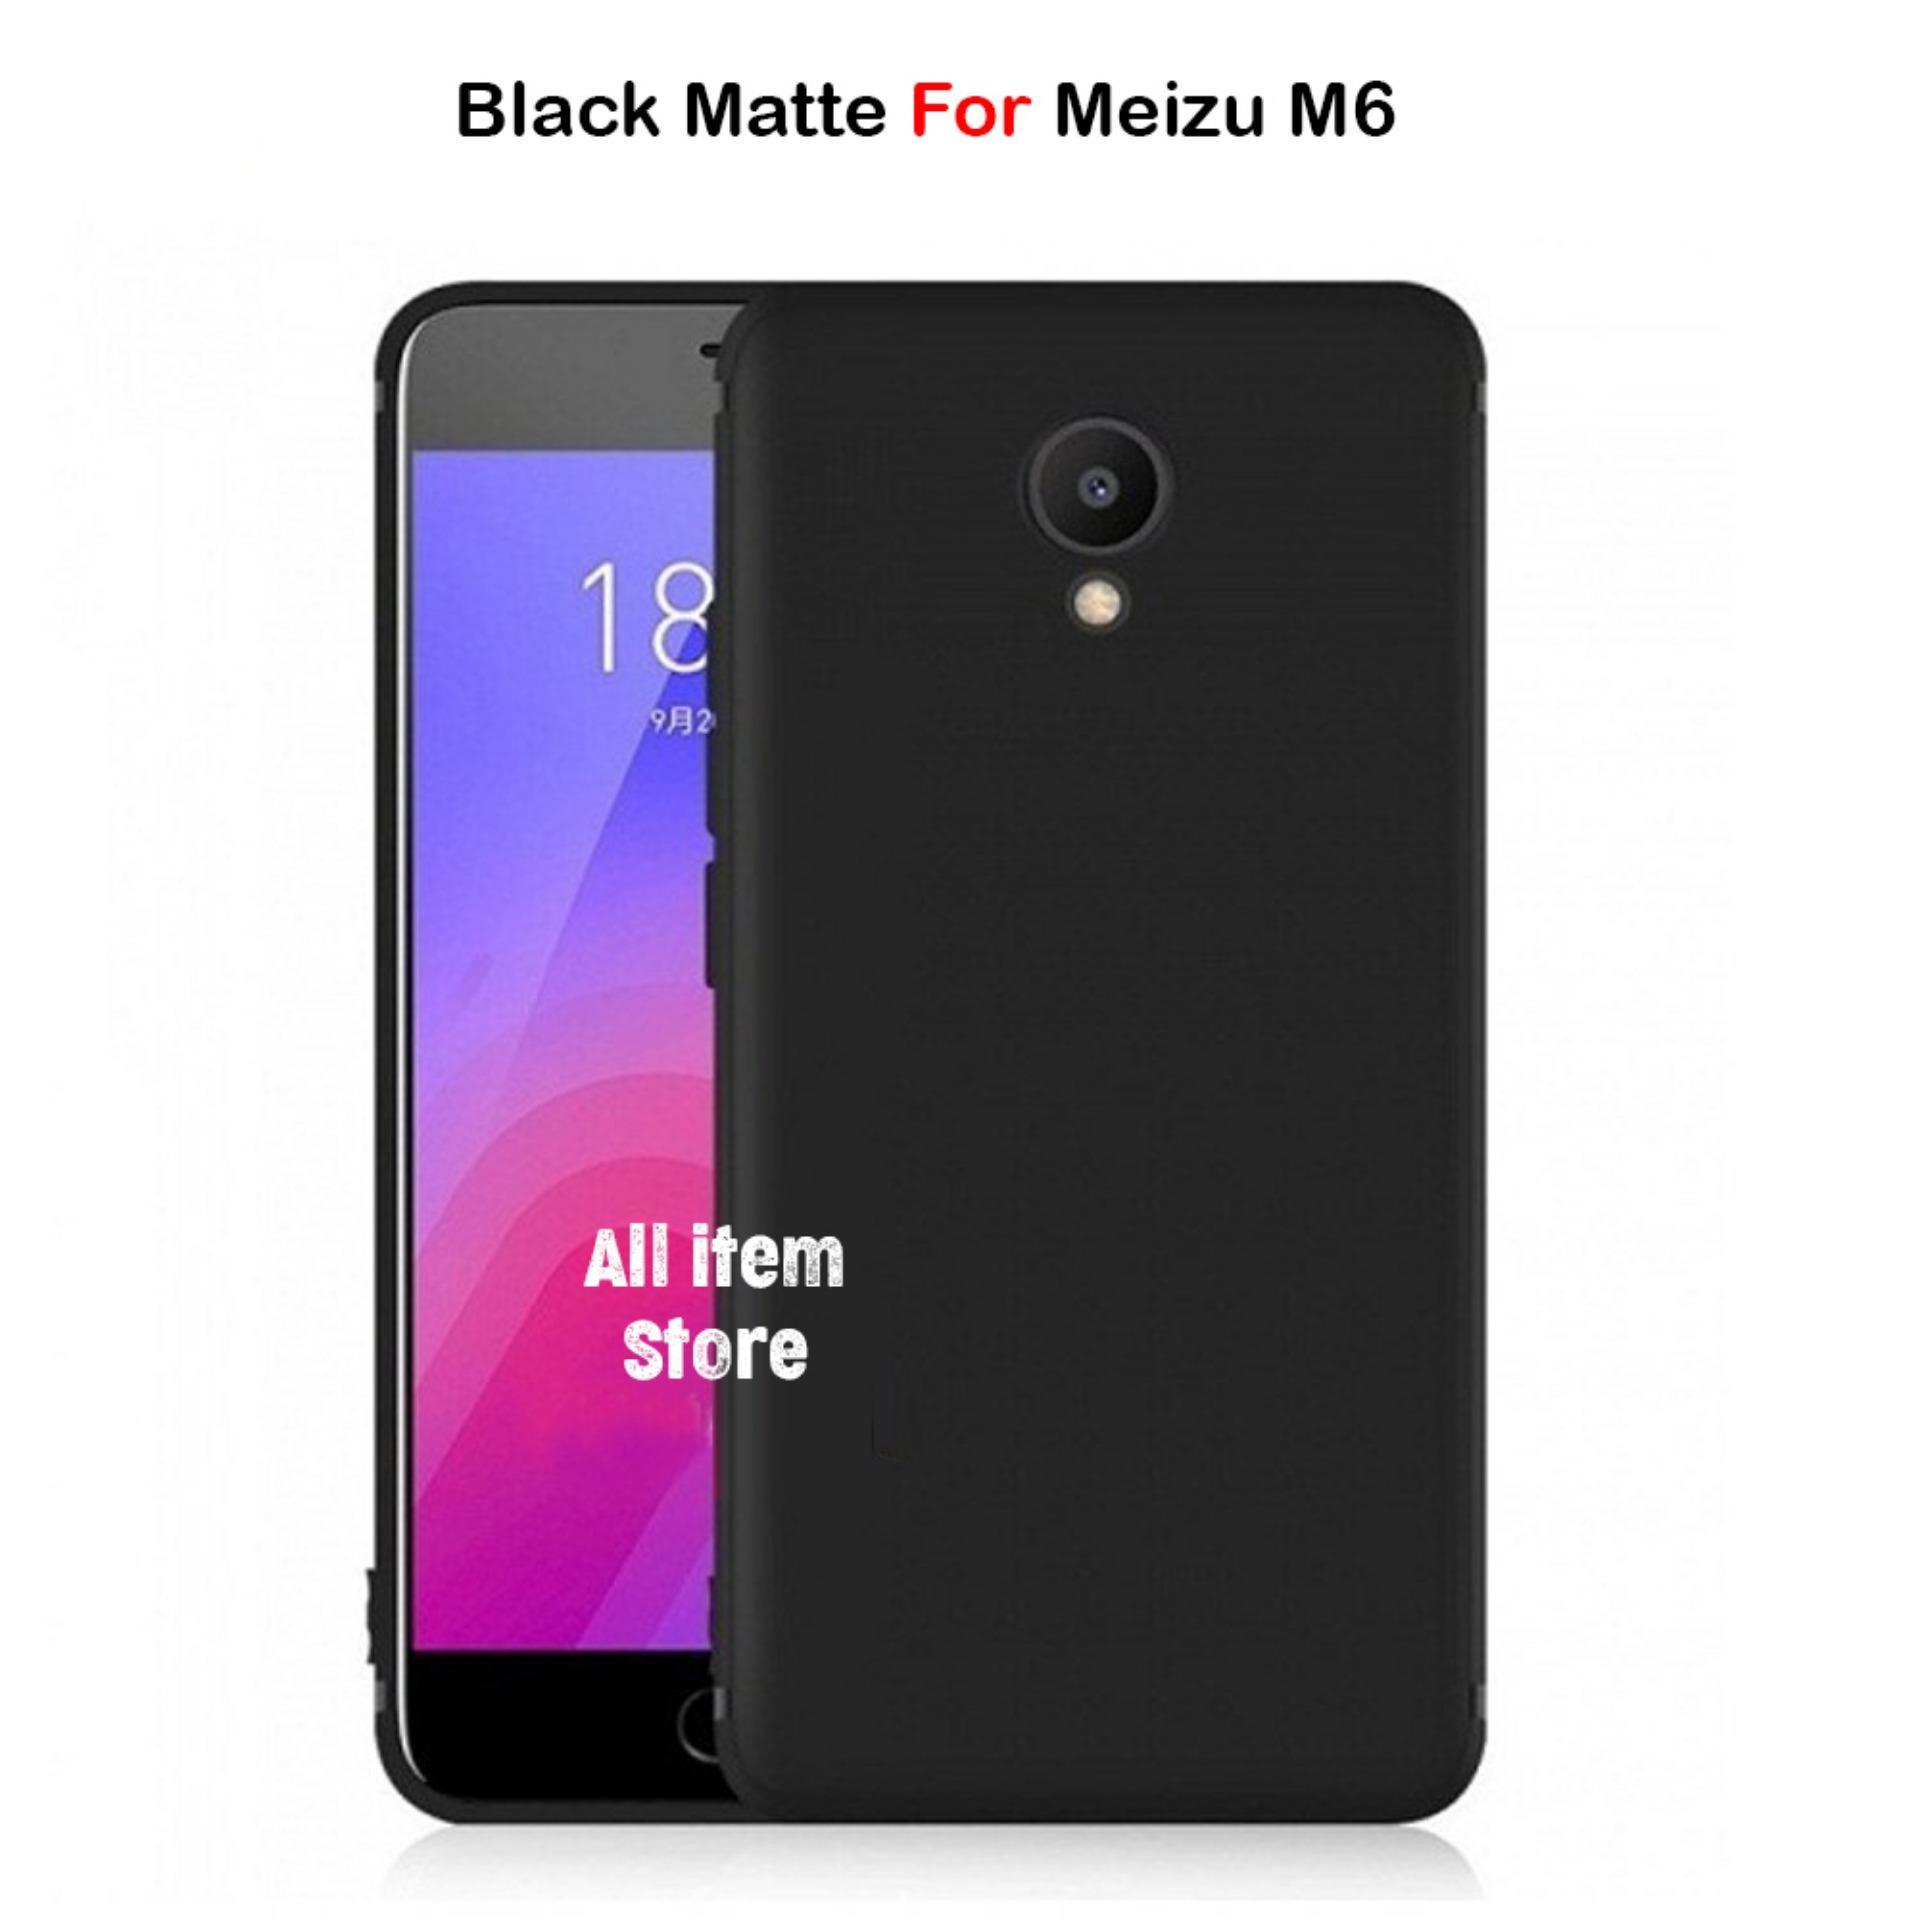 ... SAMSUNG GALAXY NOTE 3 N9000. Case Slim Black Matte Meizu M6 Baby Skin Softcase Ultra Thin Jelly Silikon Babyskin - Hitam